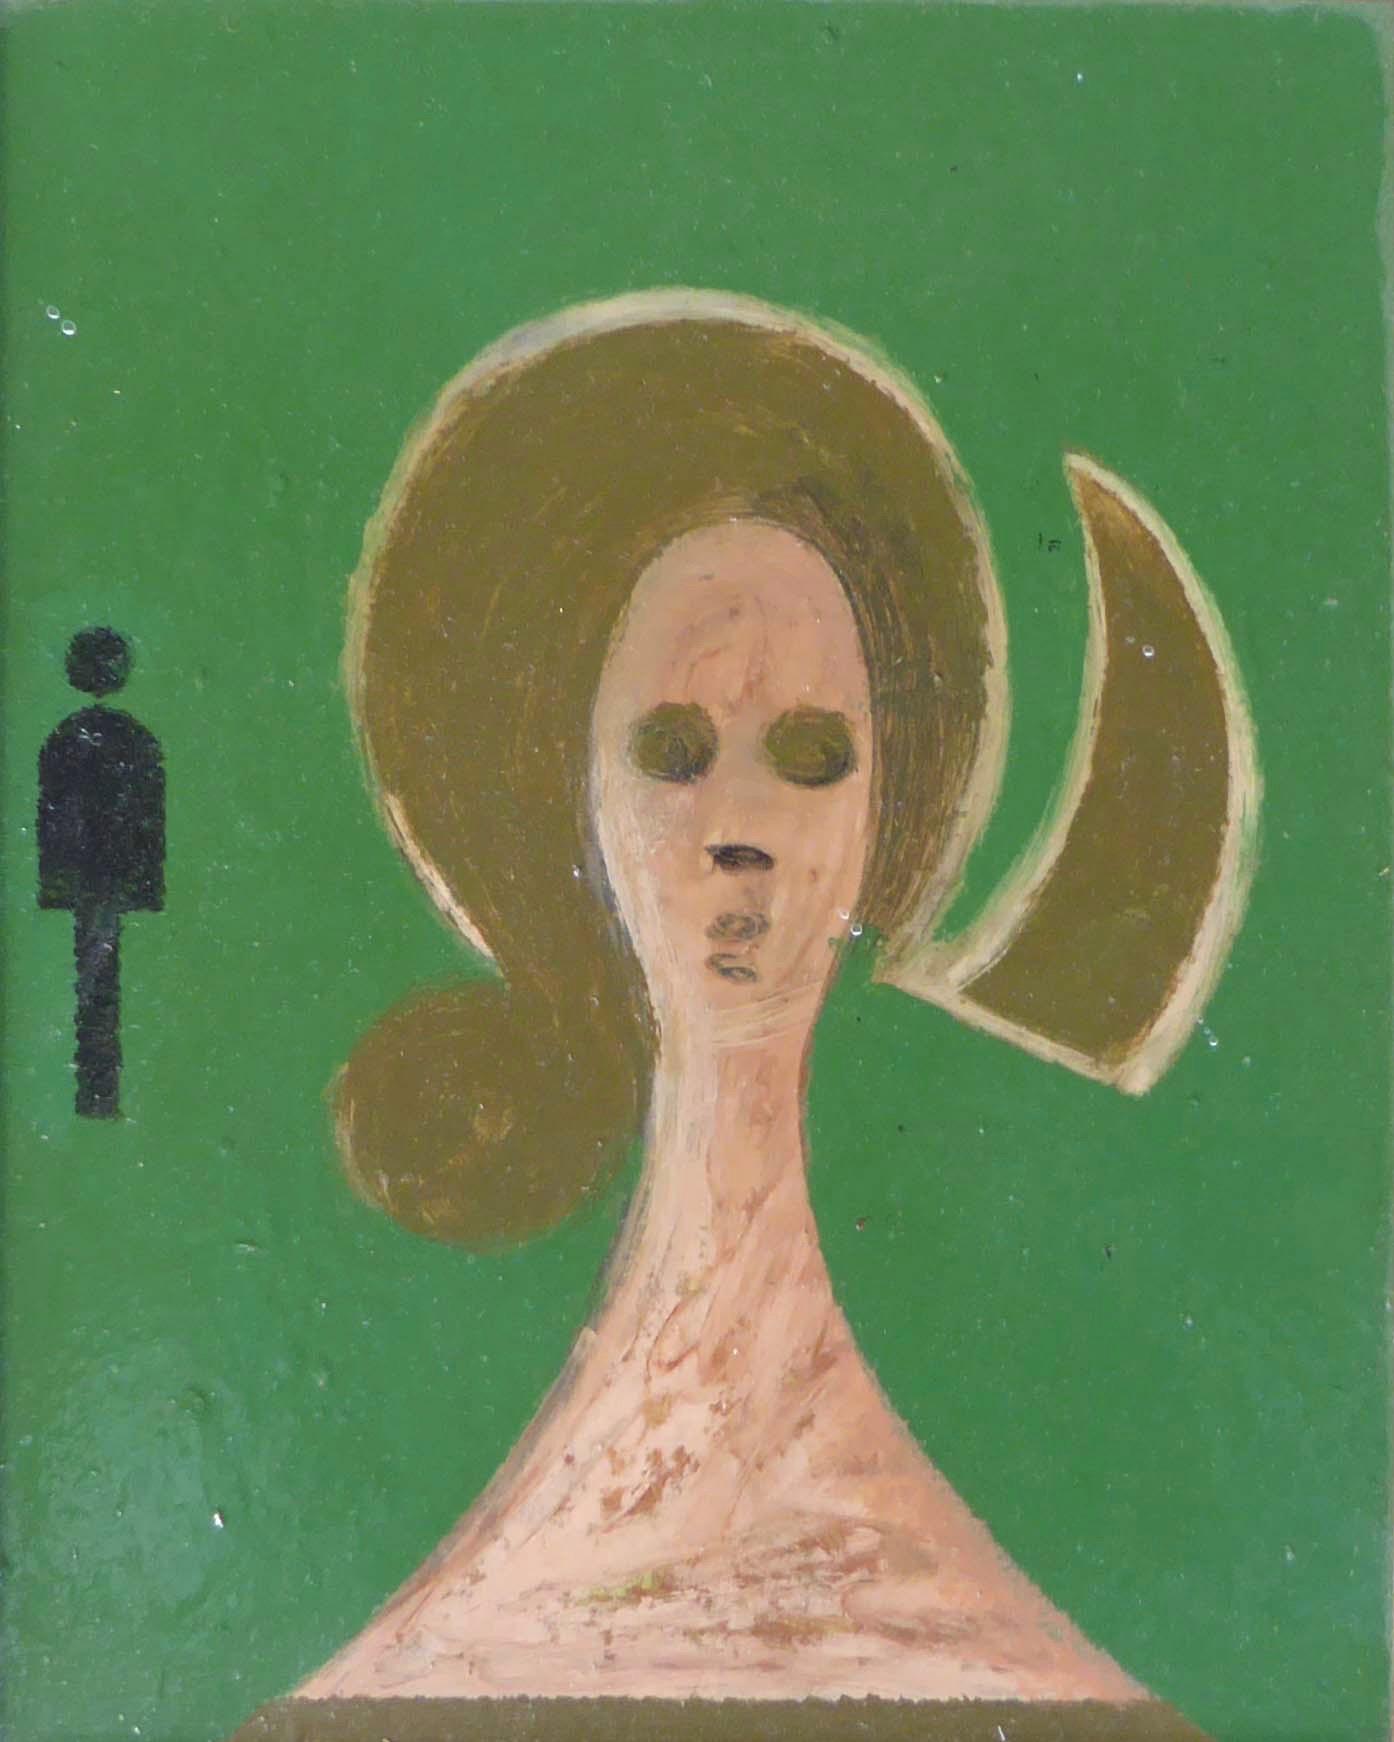 Girl's head